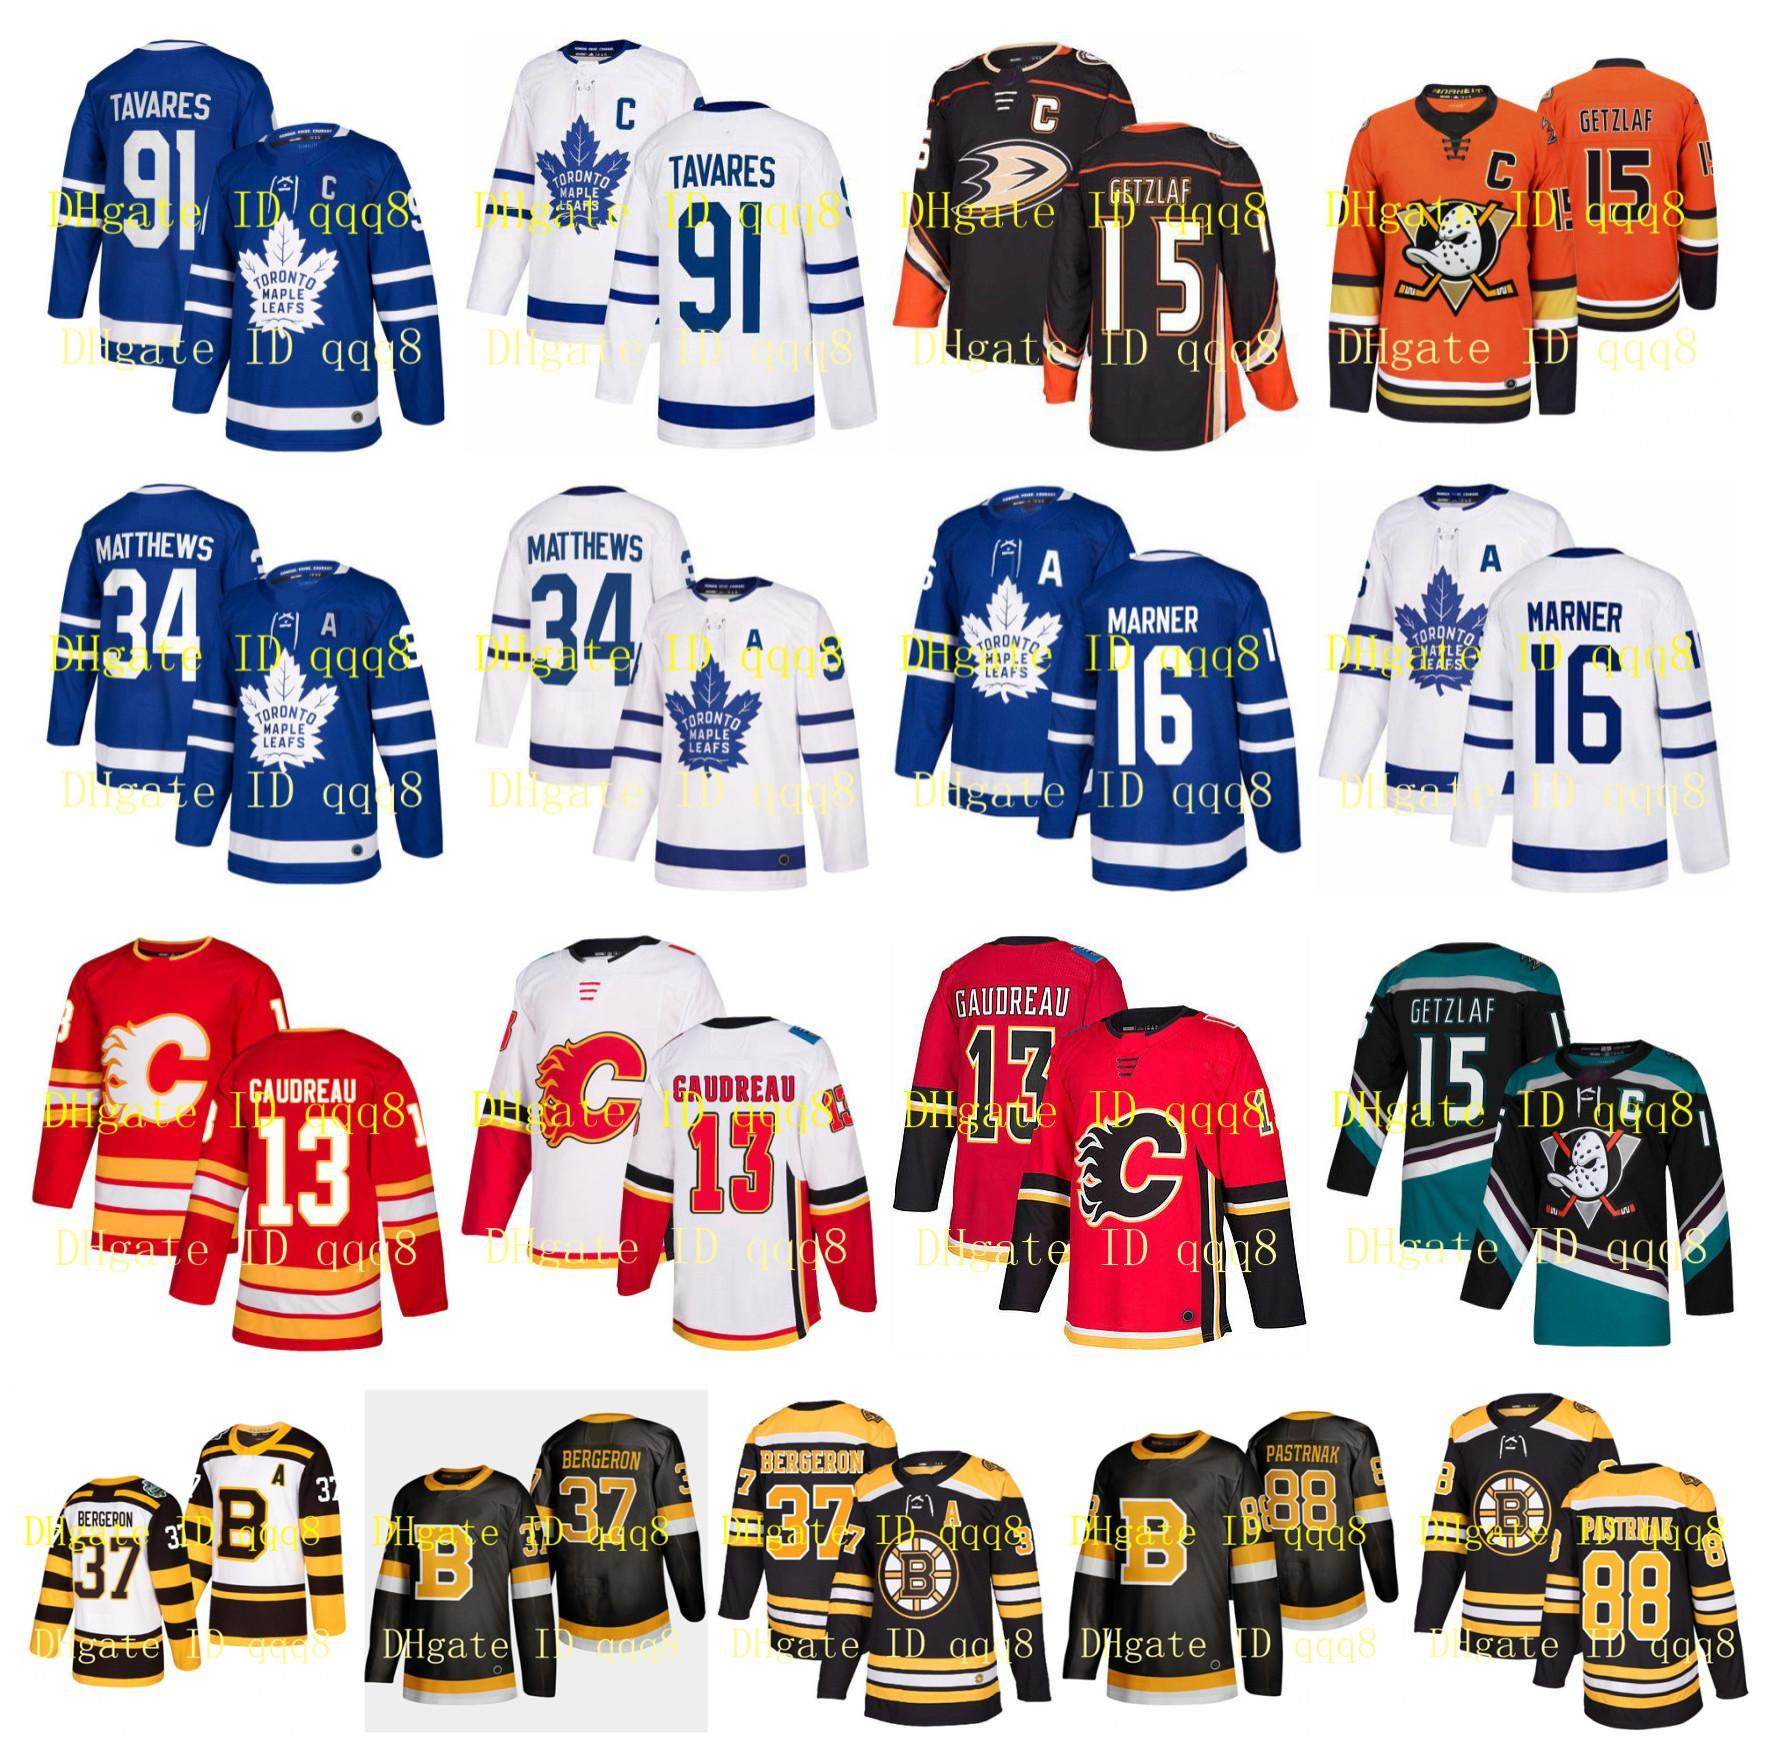 wholesale nhl hockey jerseys